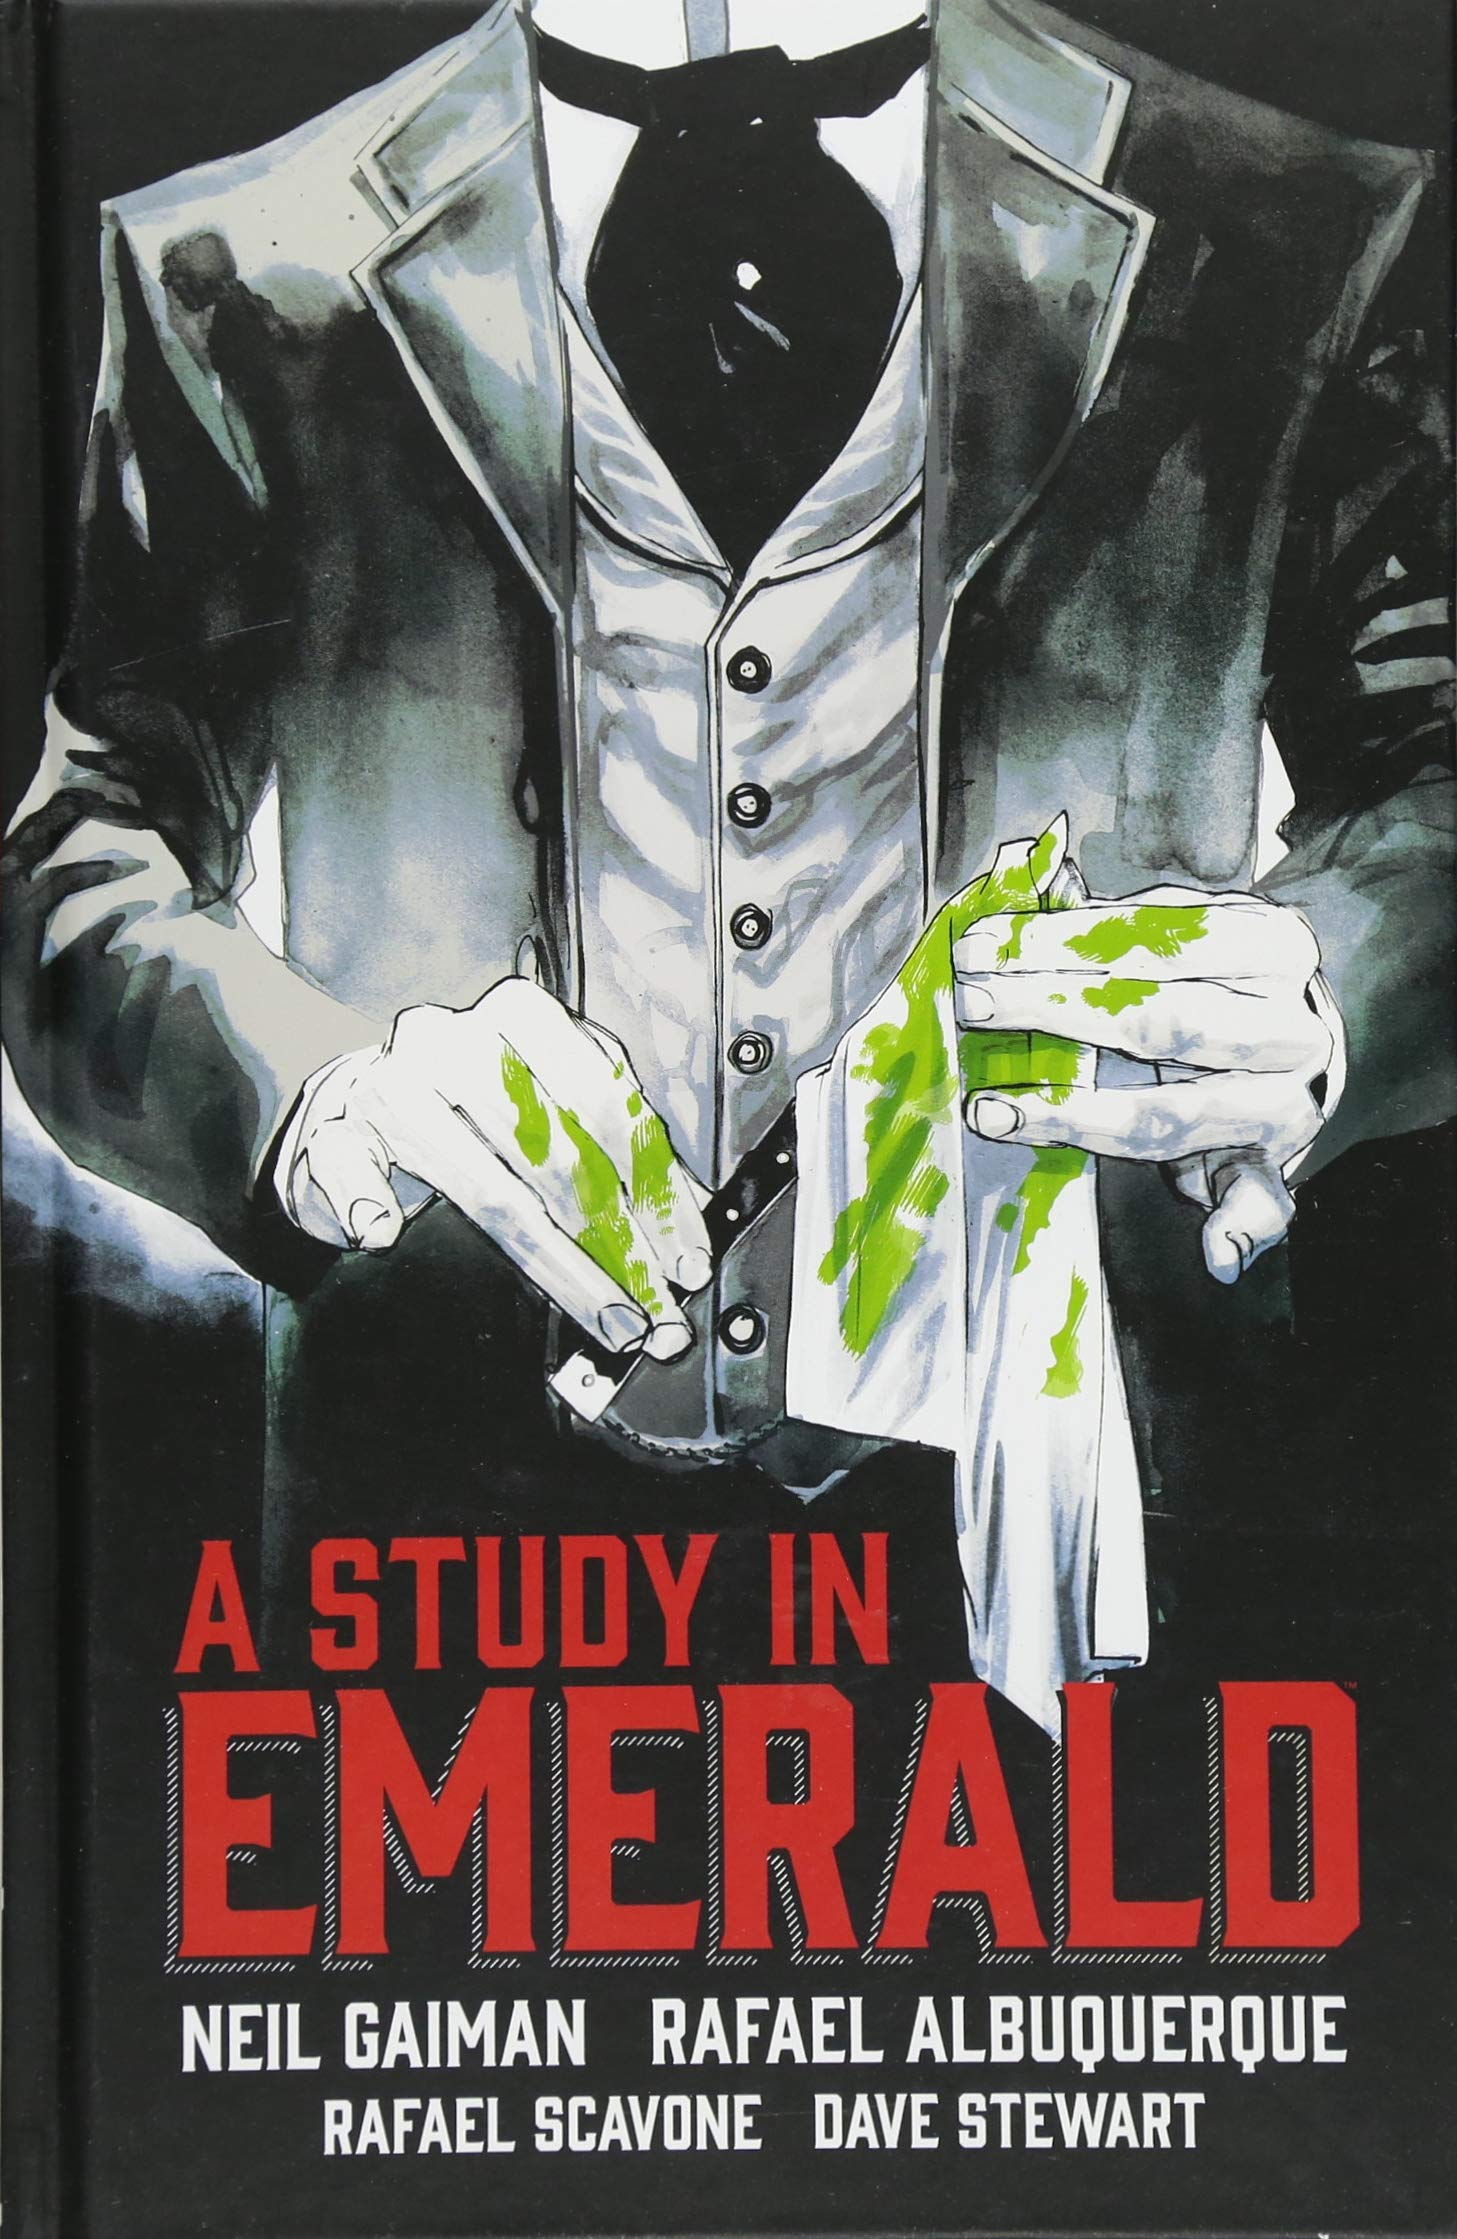 A Study in Emerald_Neil Gaiman.jpg